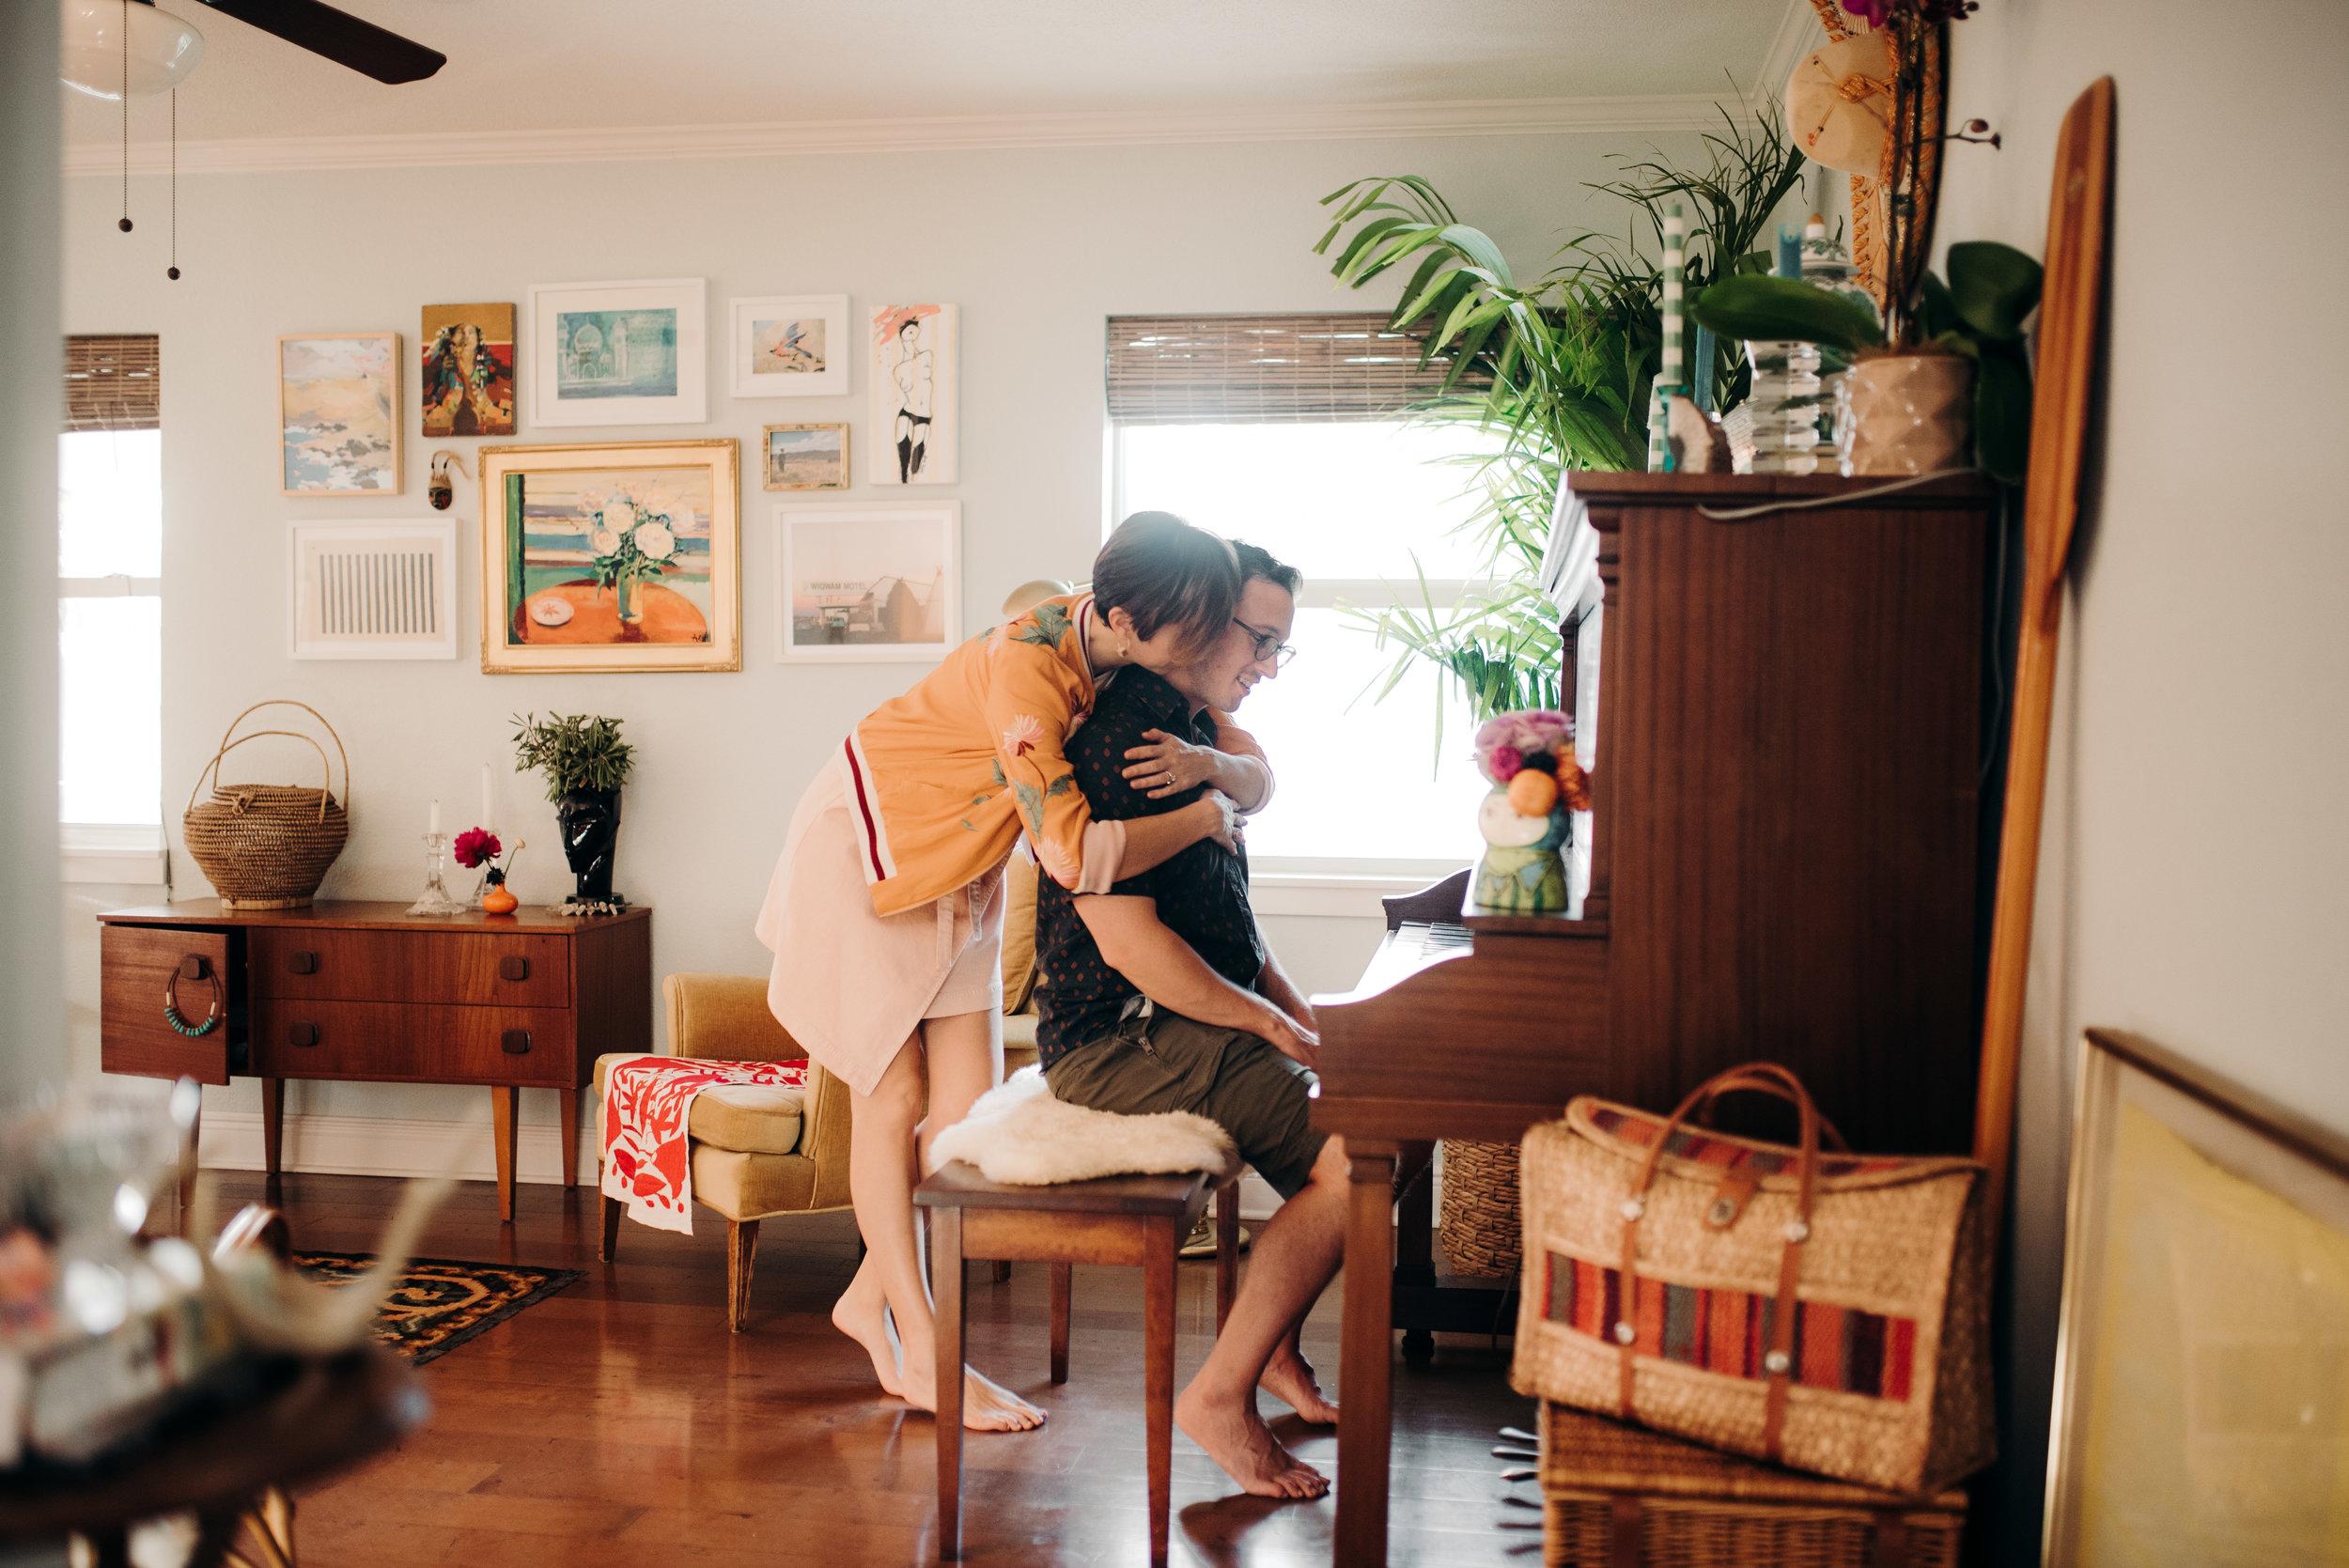 carissa-spencer-mid-century-editorial-in-home-couple-session-orlando-florida-253.jpg